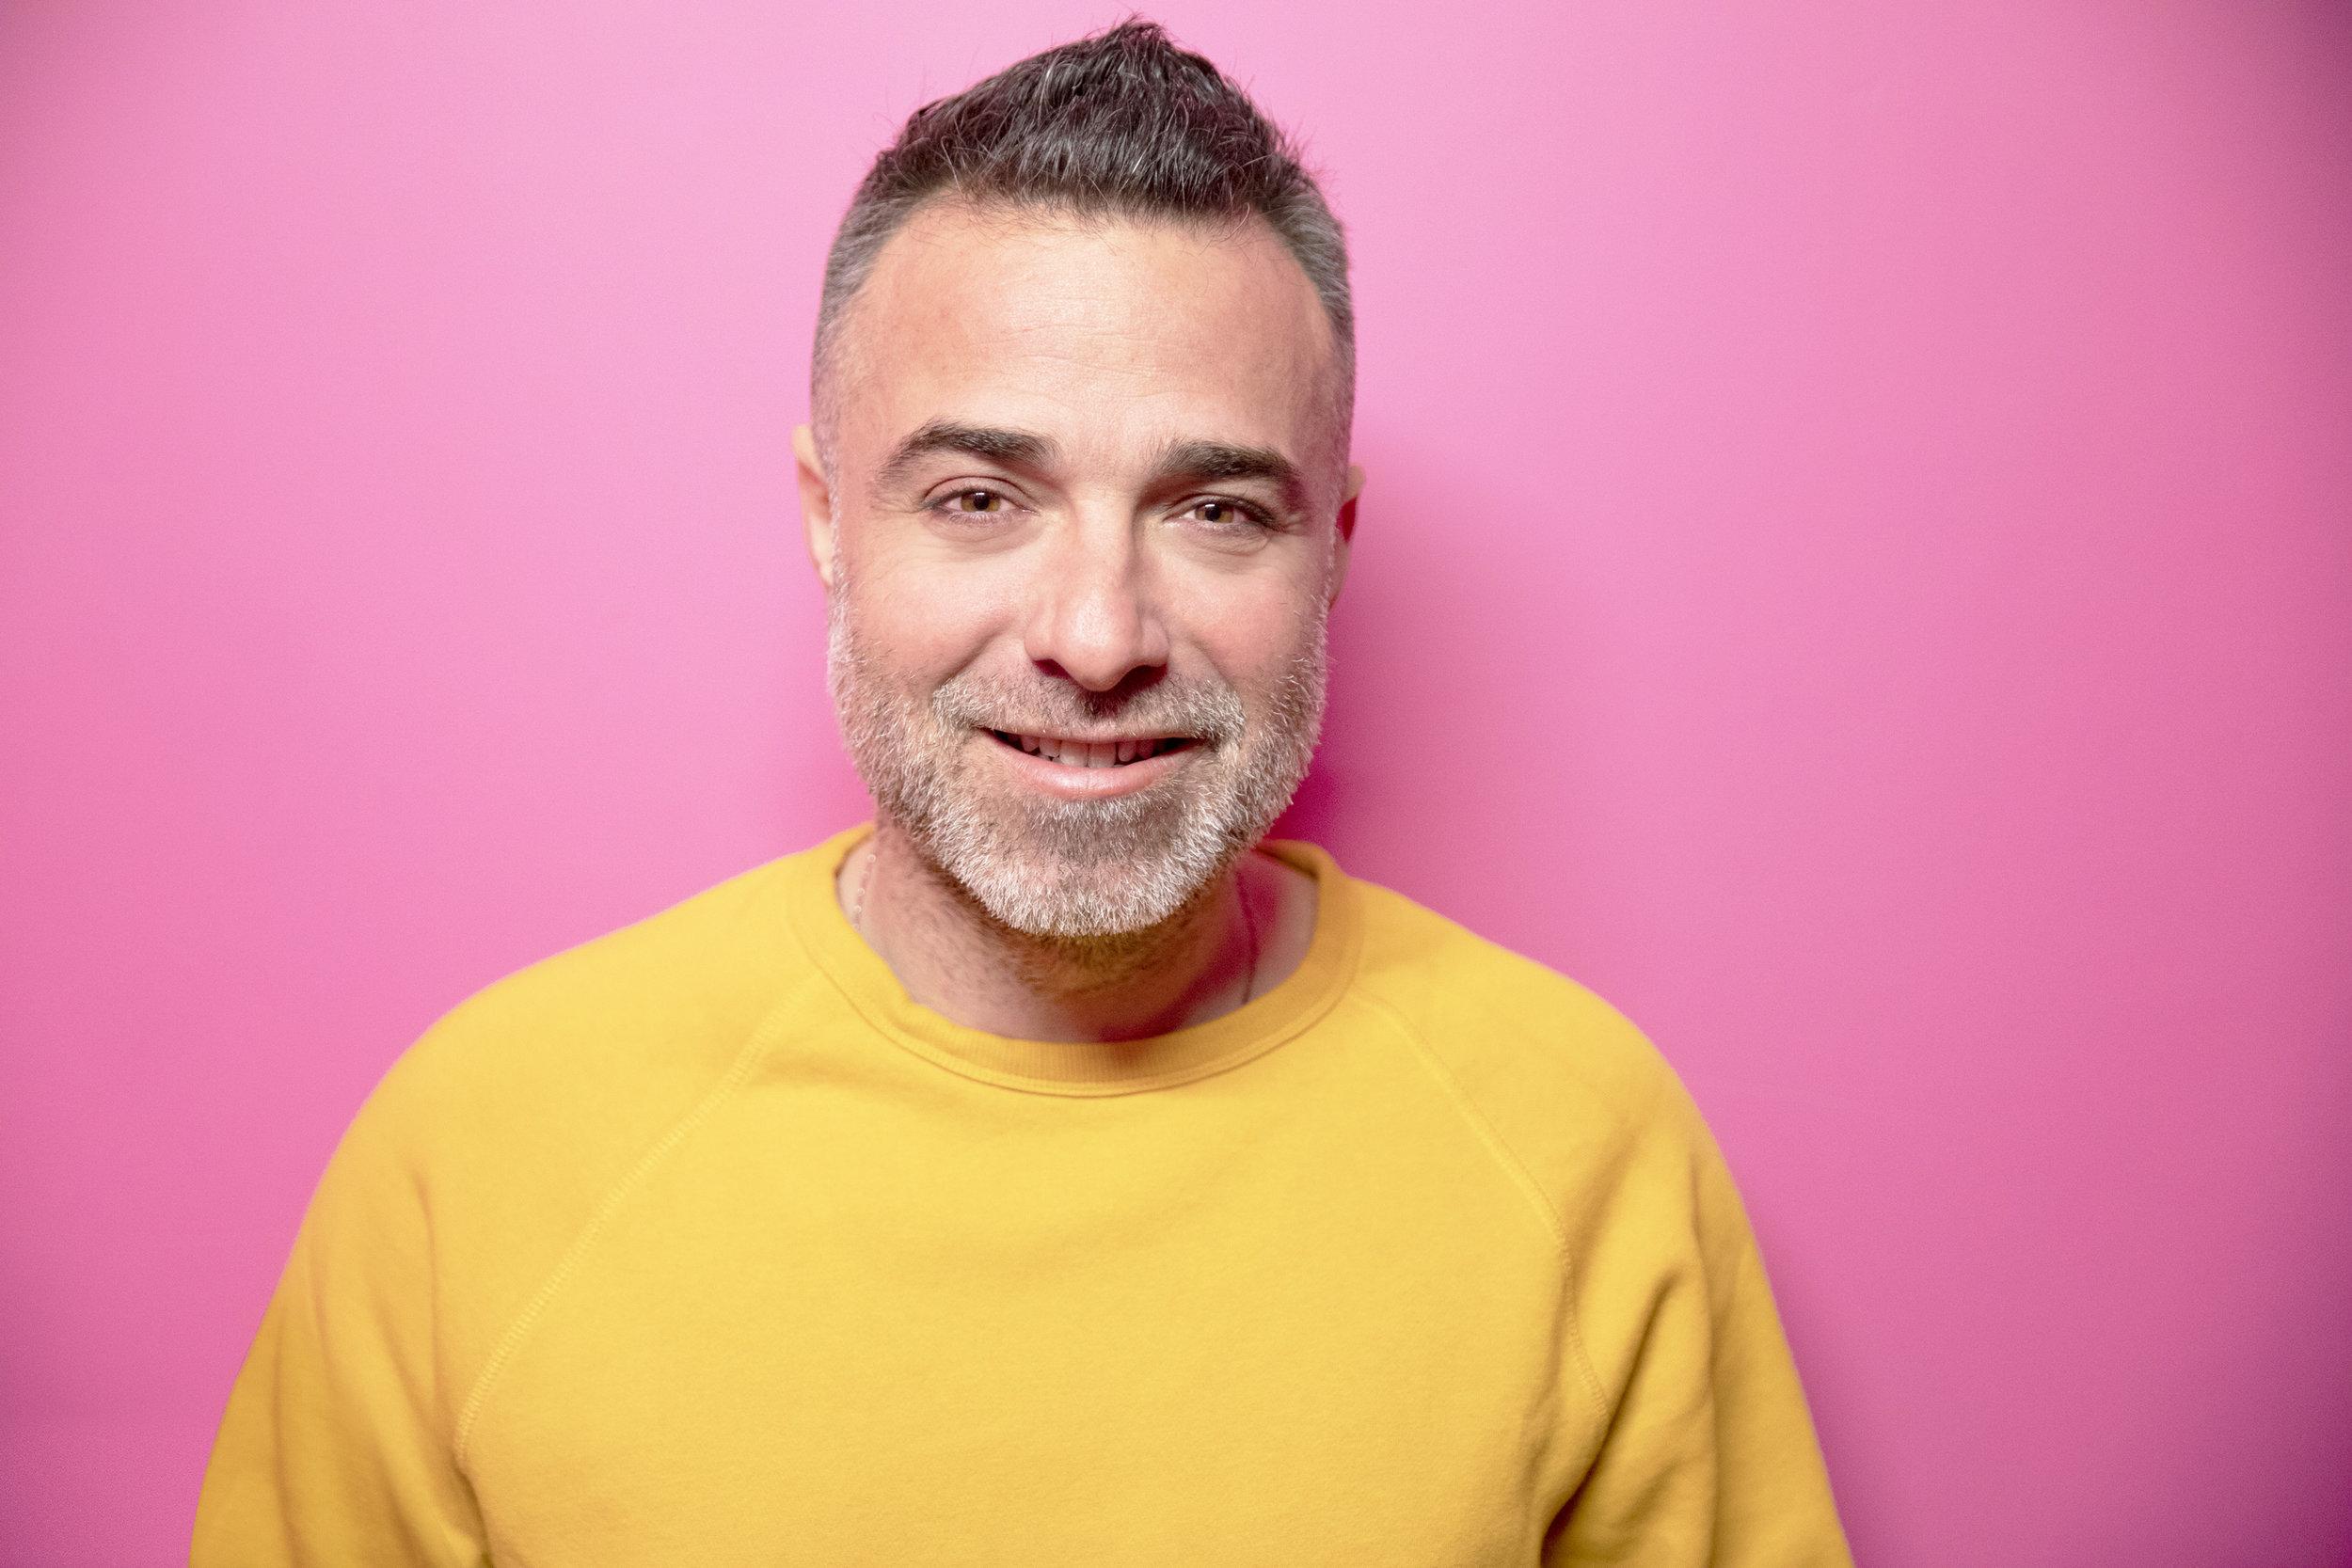 Greg-Delon-C-Steph-DLH-Pink-Yellow.jpg